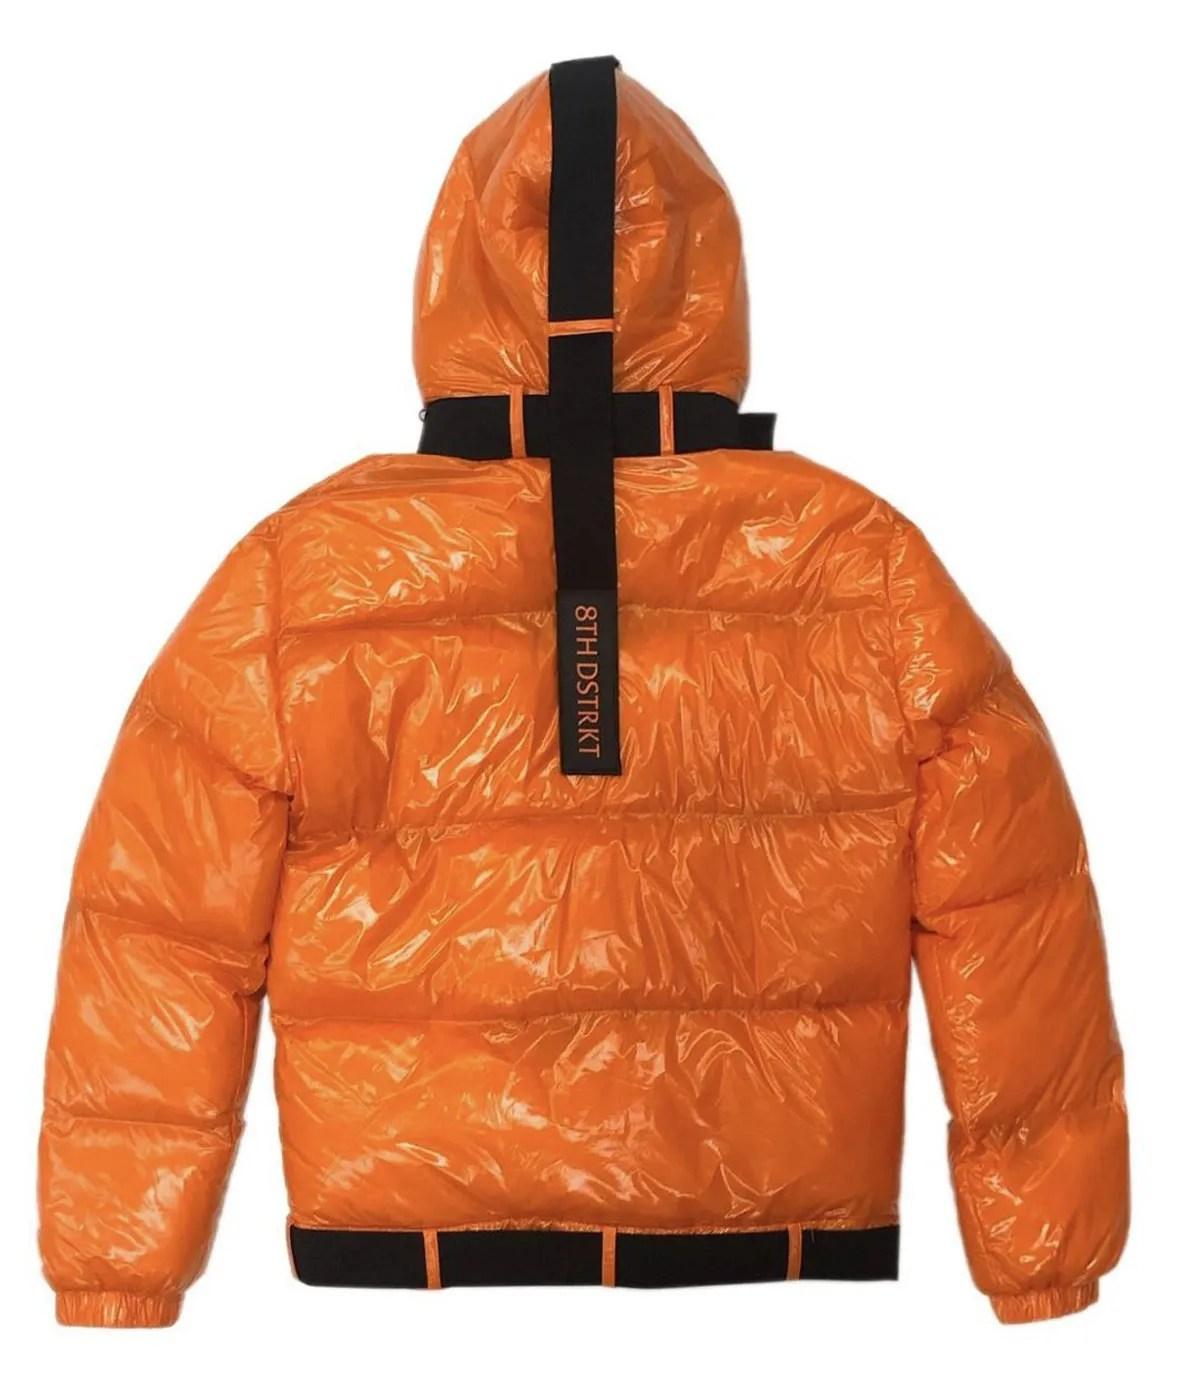 8th-dstrkt-bubble-jacket